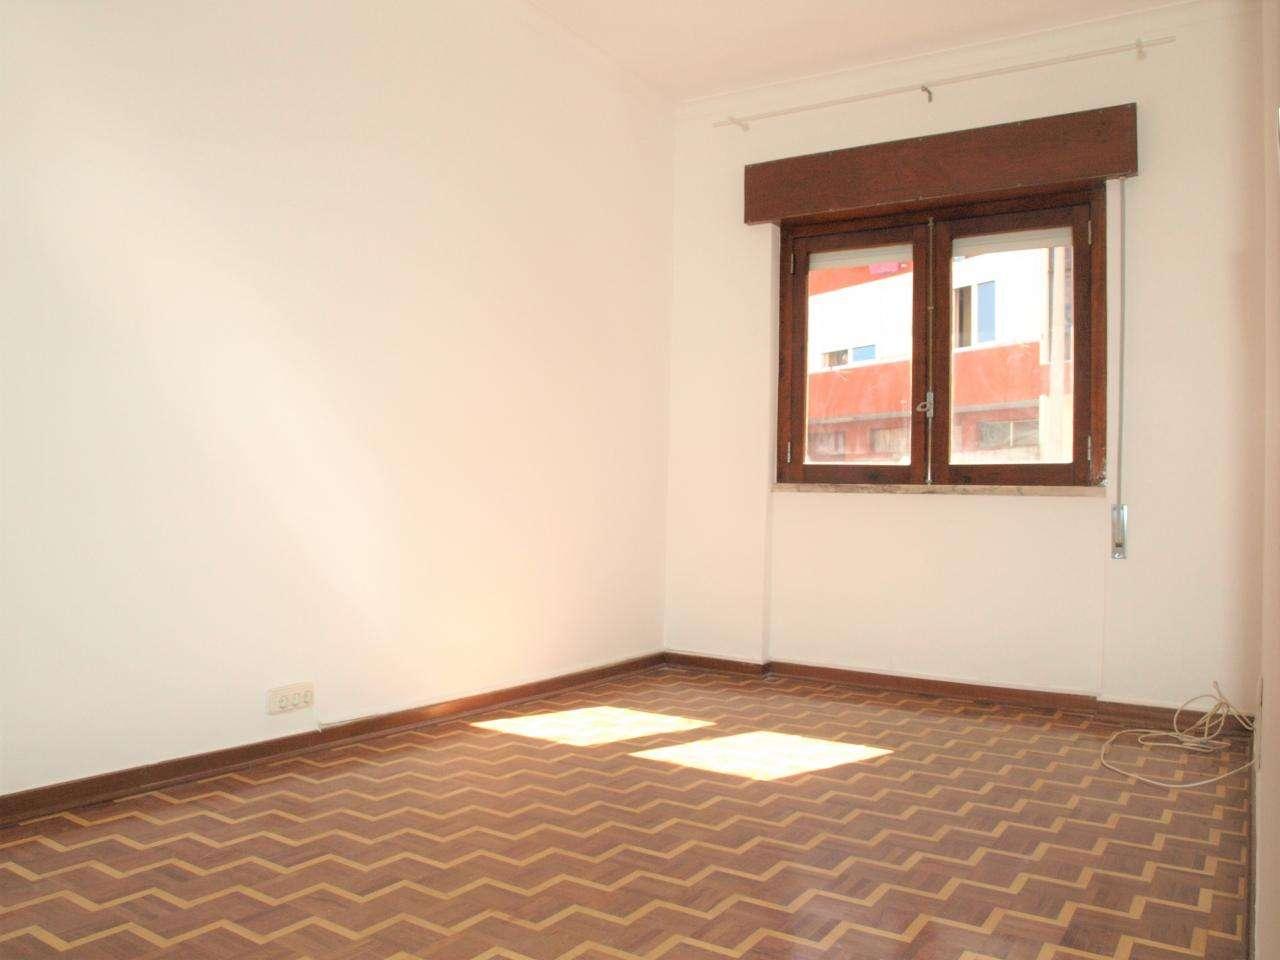 Apartamento para arrendar, Corroios, Setúbal - Foto 3